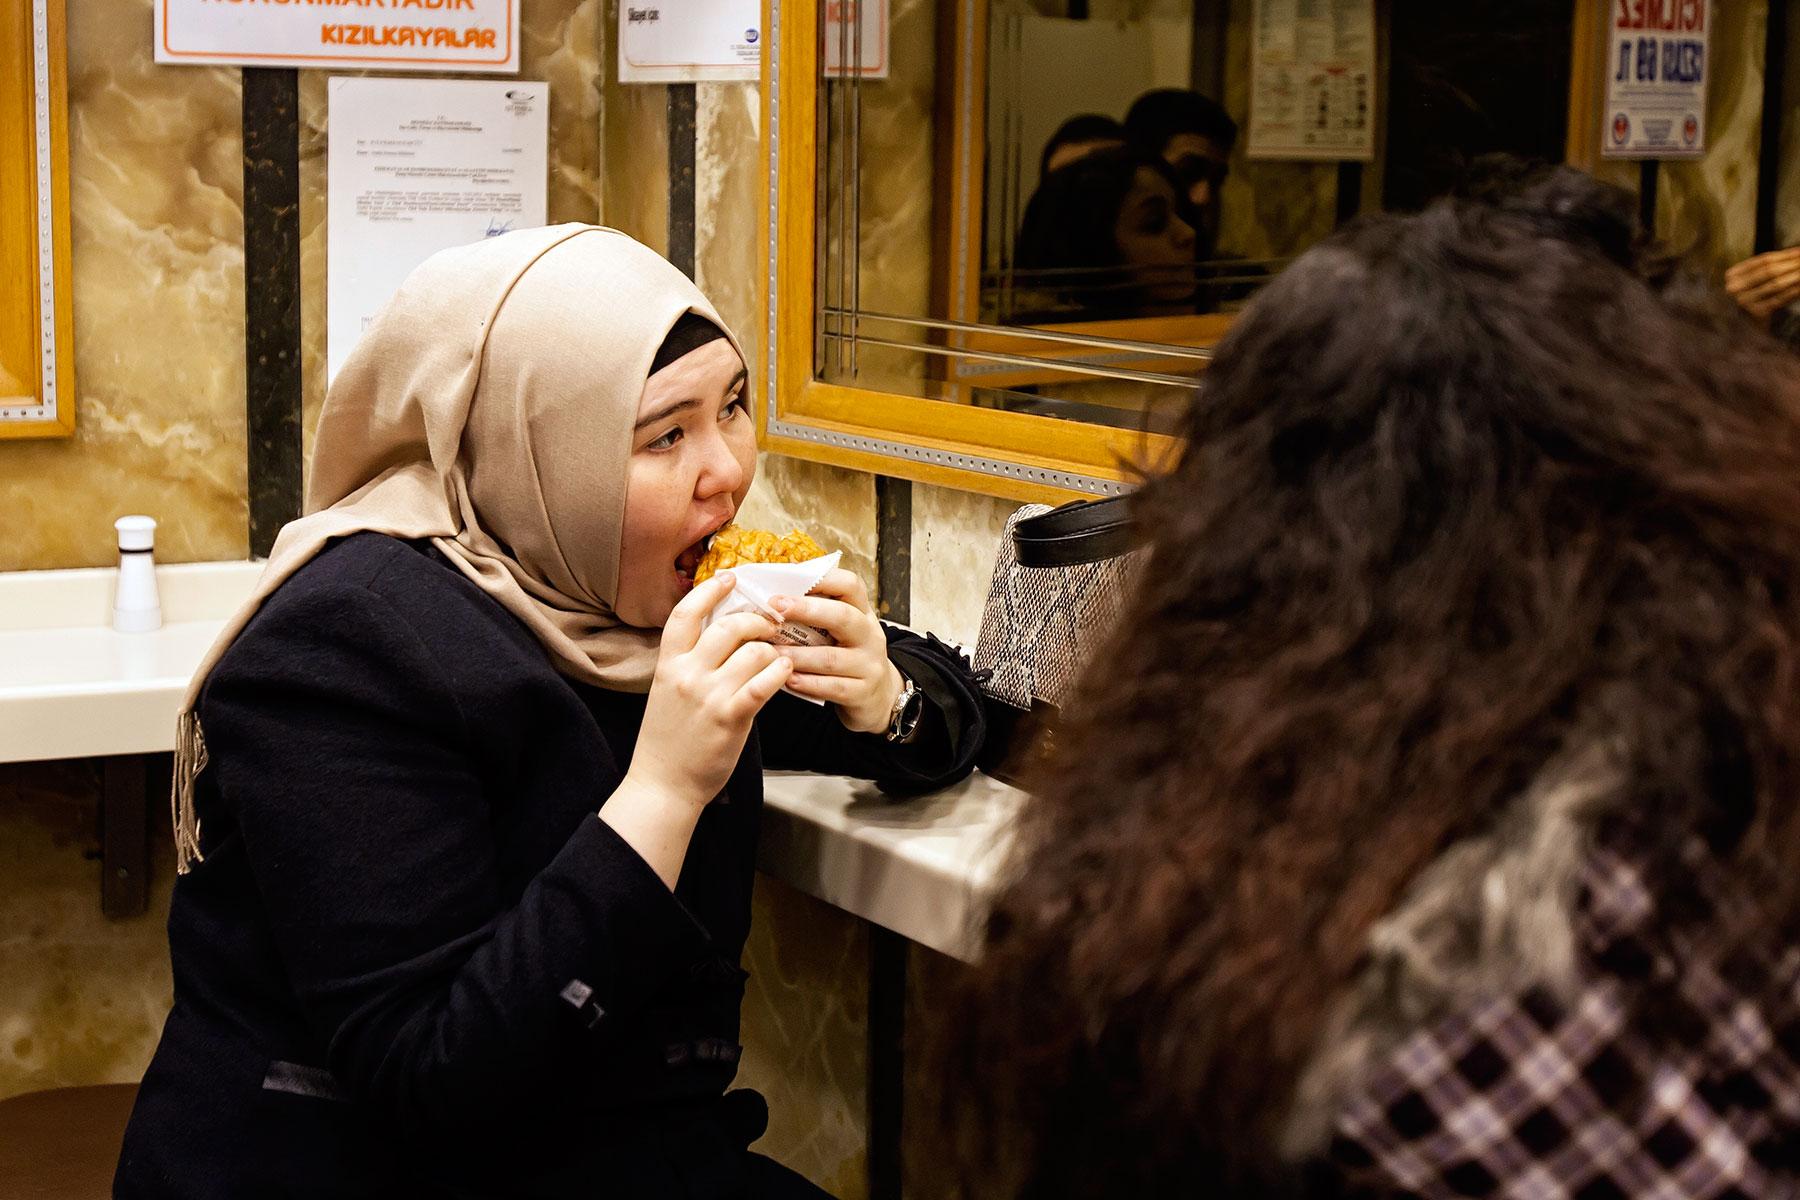 A-Cılgın-customer-enjoying-an-islak-burger